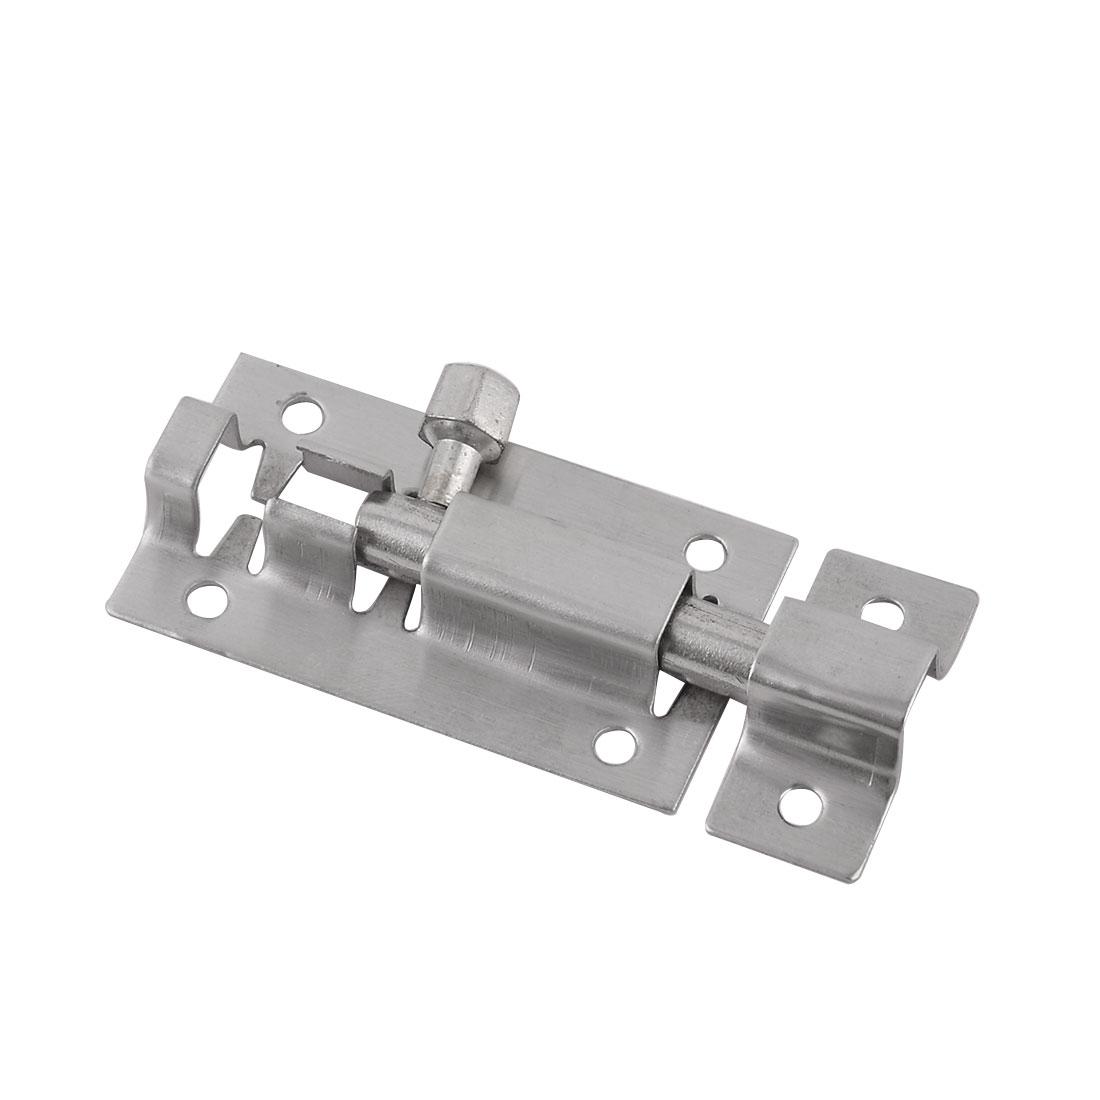 Cabinet Door Gate 6.3cm Long Stainless Steel Latch Barrel Slide Bolt Silver Tone